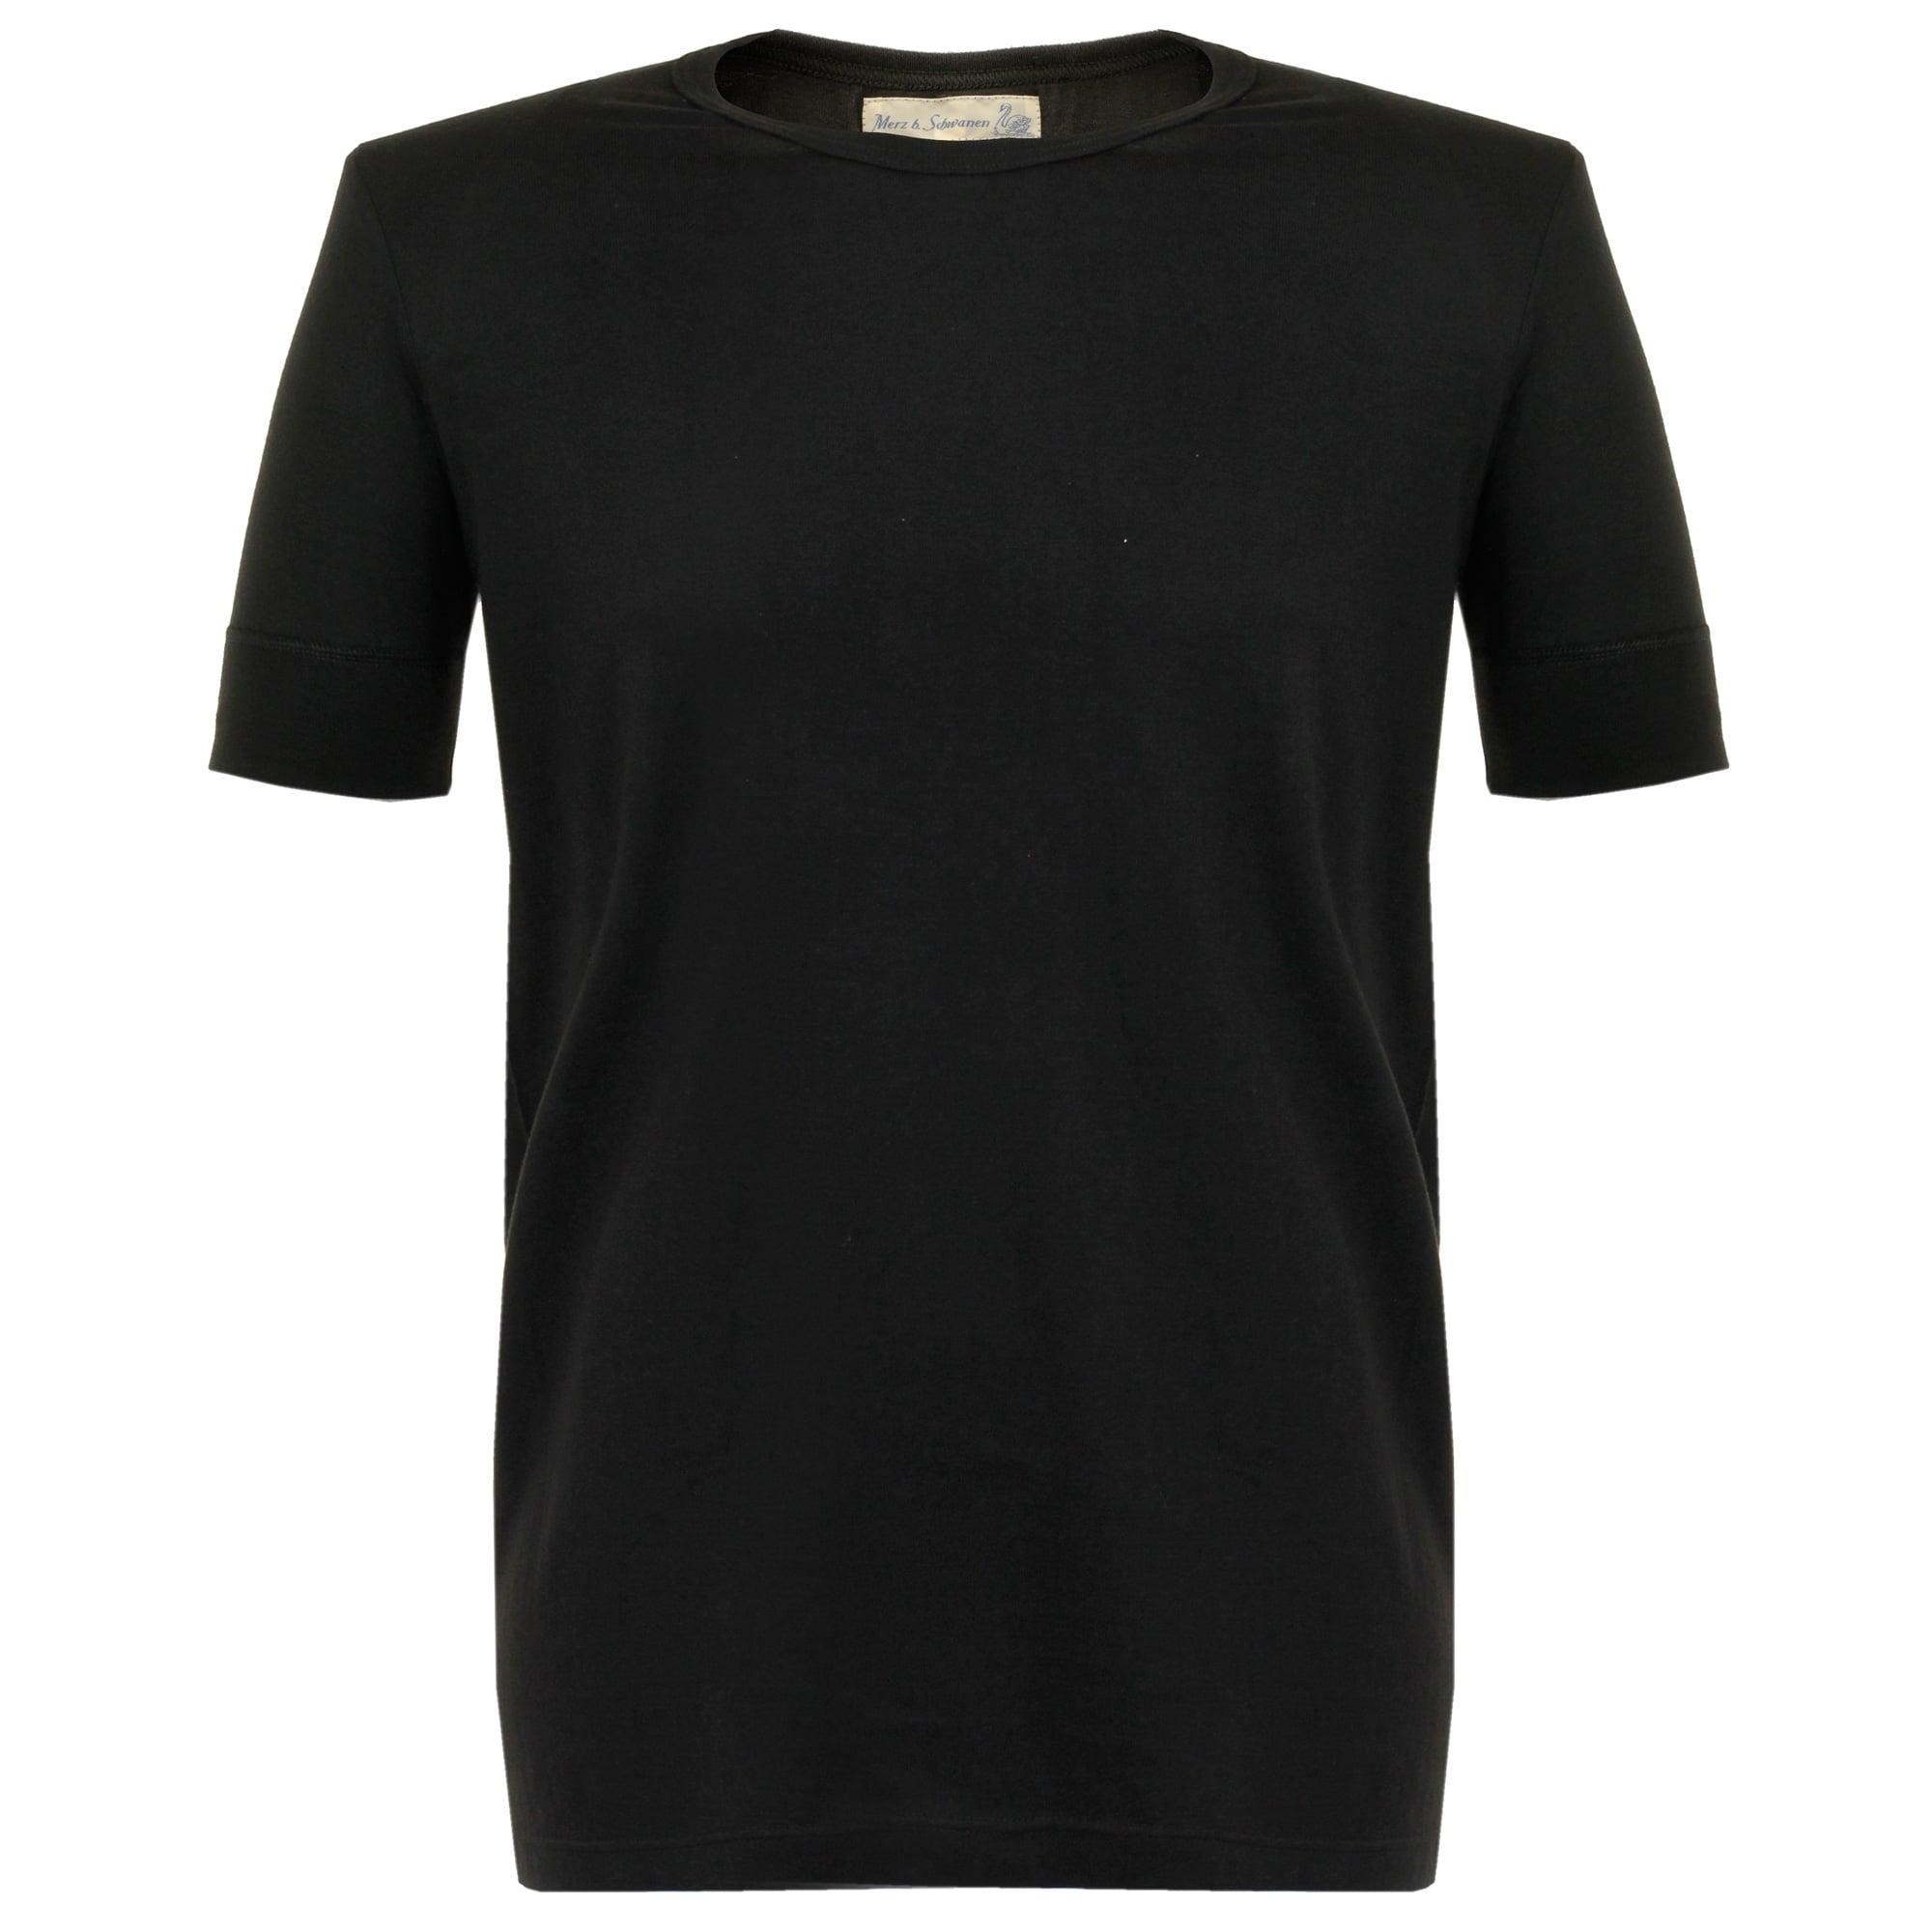 Merz B. Schwanen 1960  039 s Army Black T-Shirt 52ae7df87bc